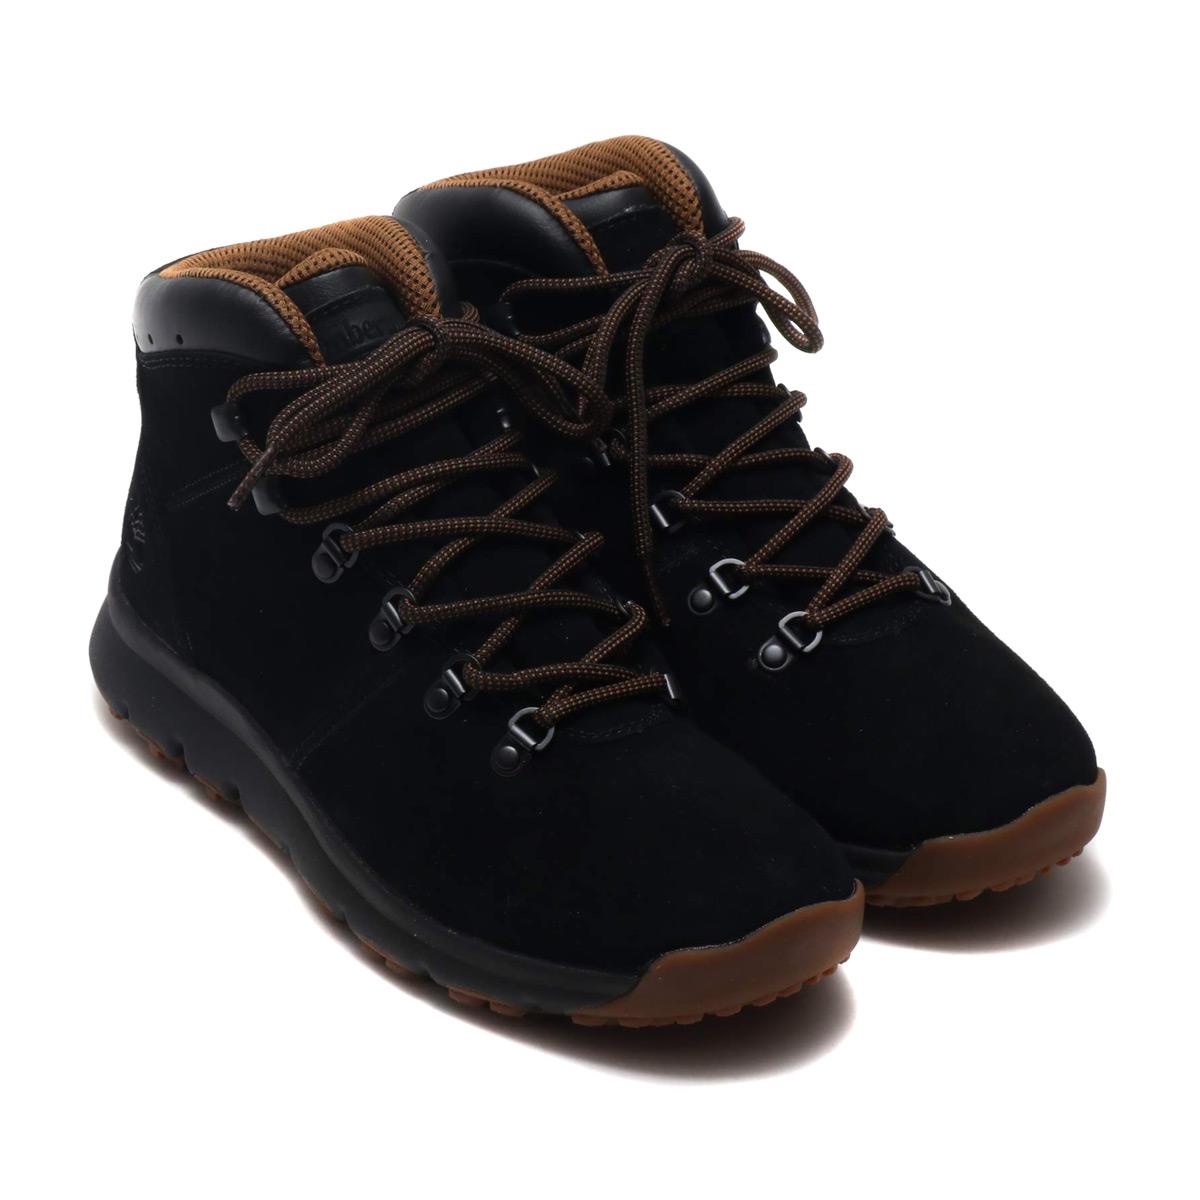 Timberland WORLD HIKER (ティンバーランド ワールド ハイカー)Black Suede【メンズ ブーツ】18FA-I